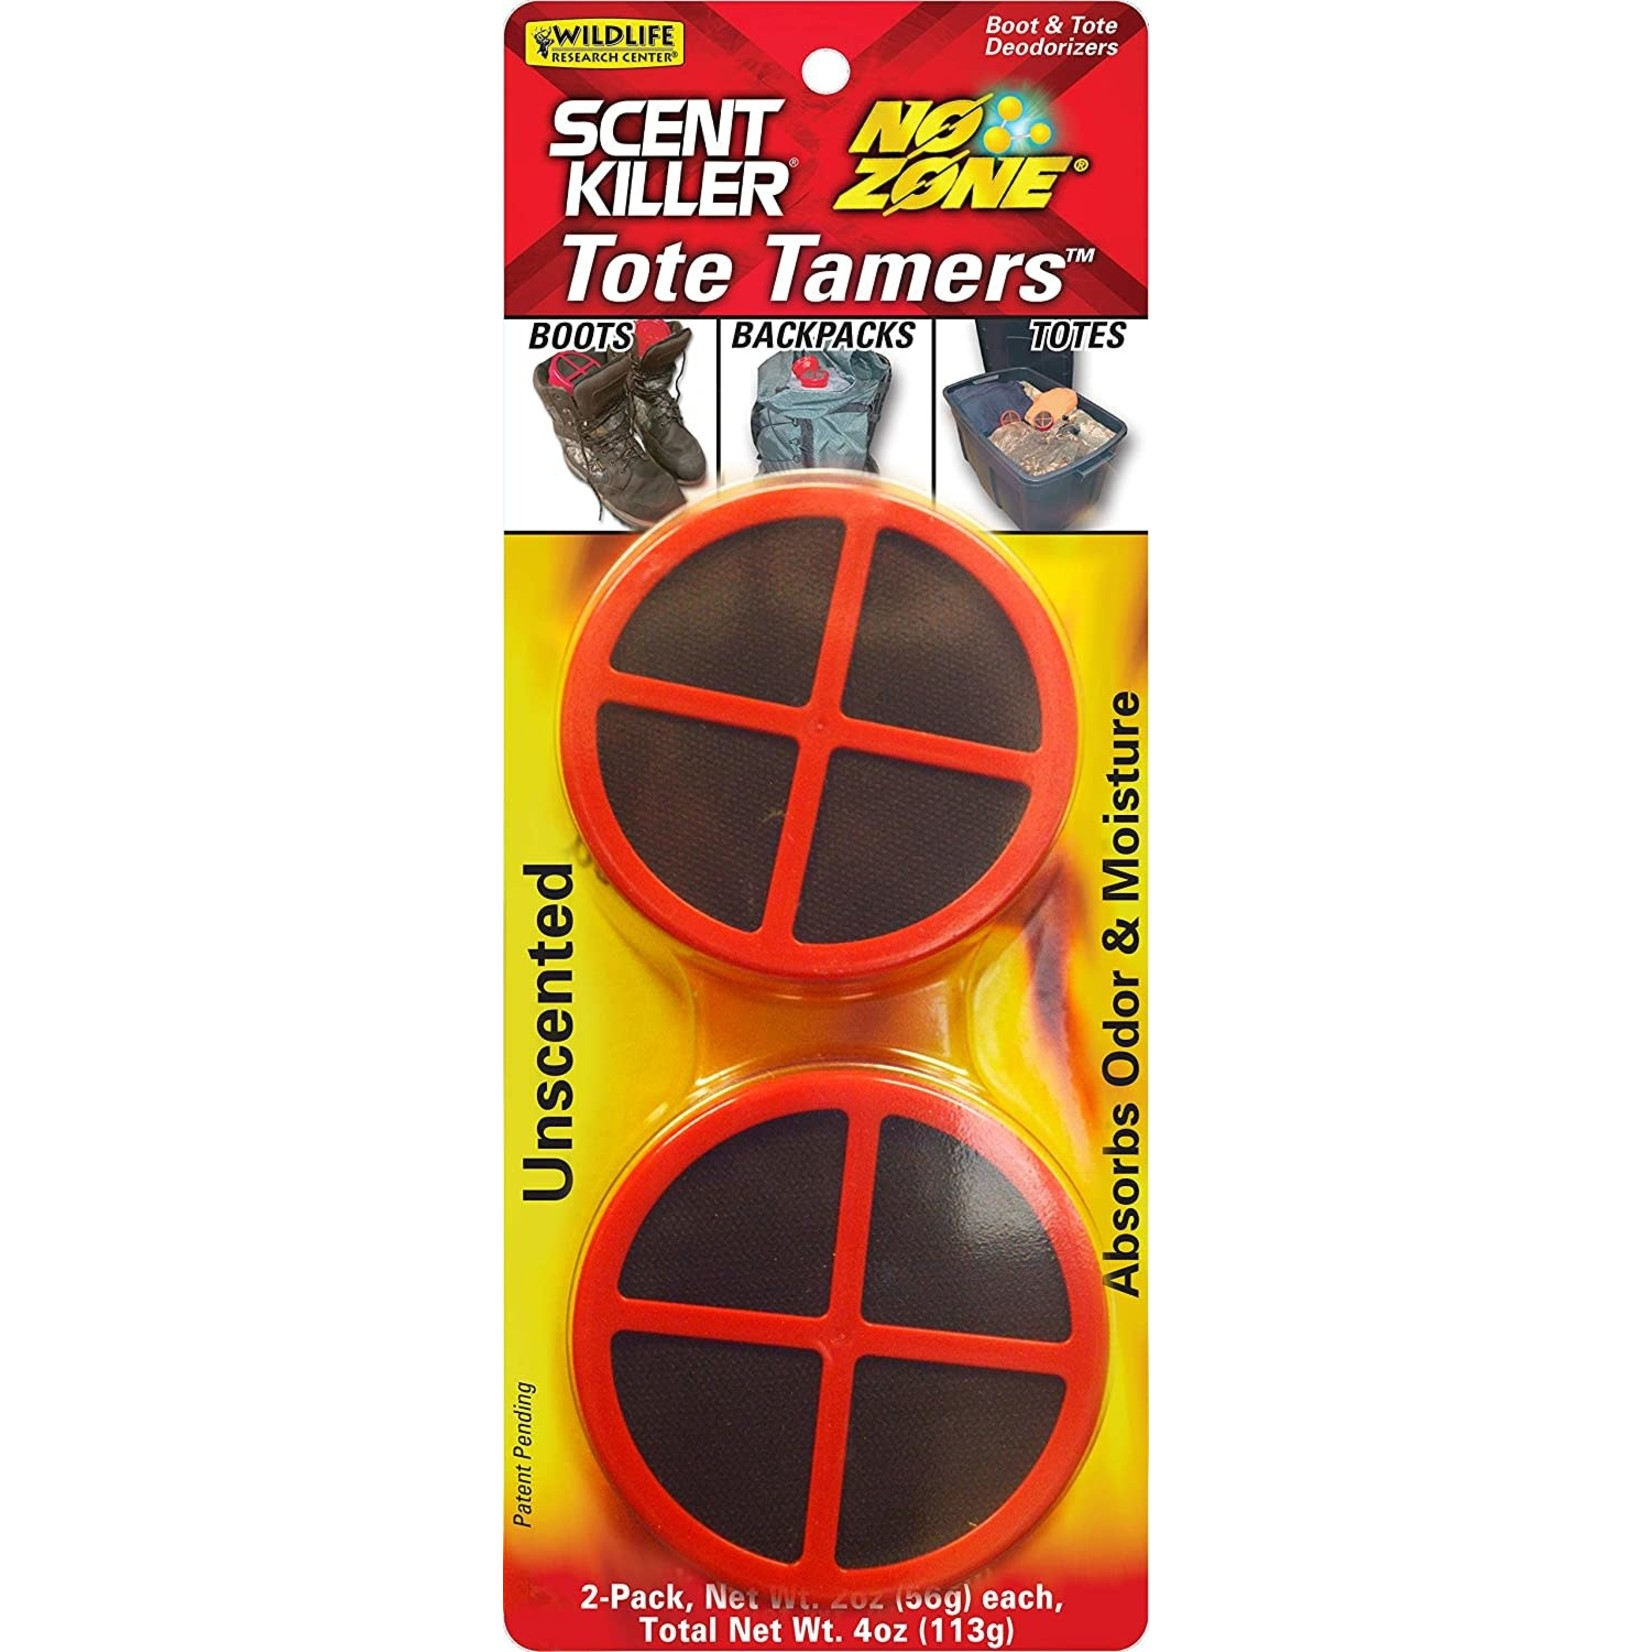 Wildlife Research Center Scent Killer No Zone Tote Tamer 2-Pack